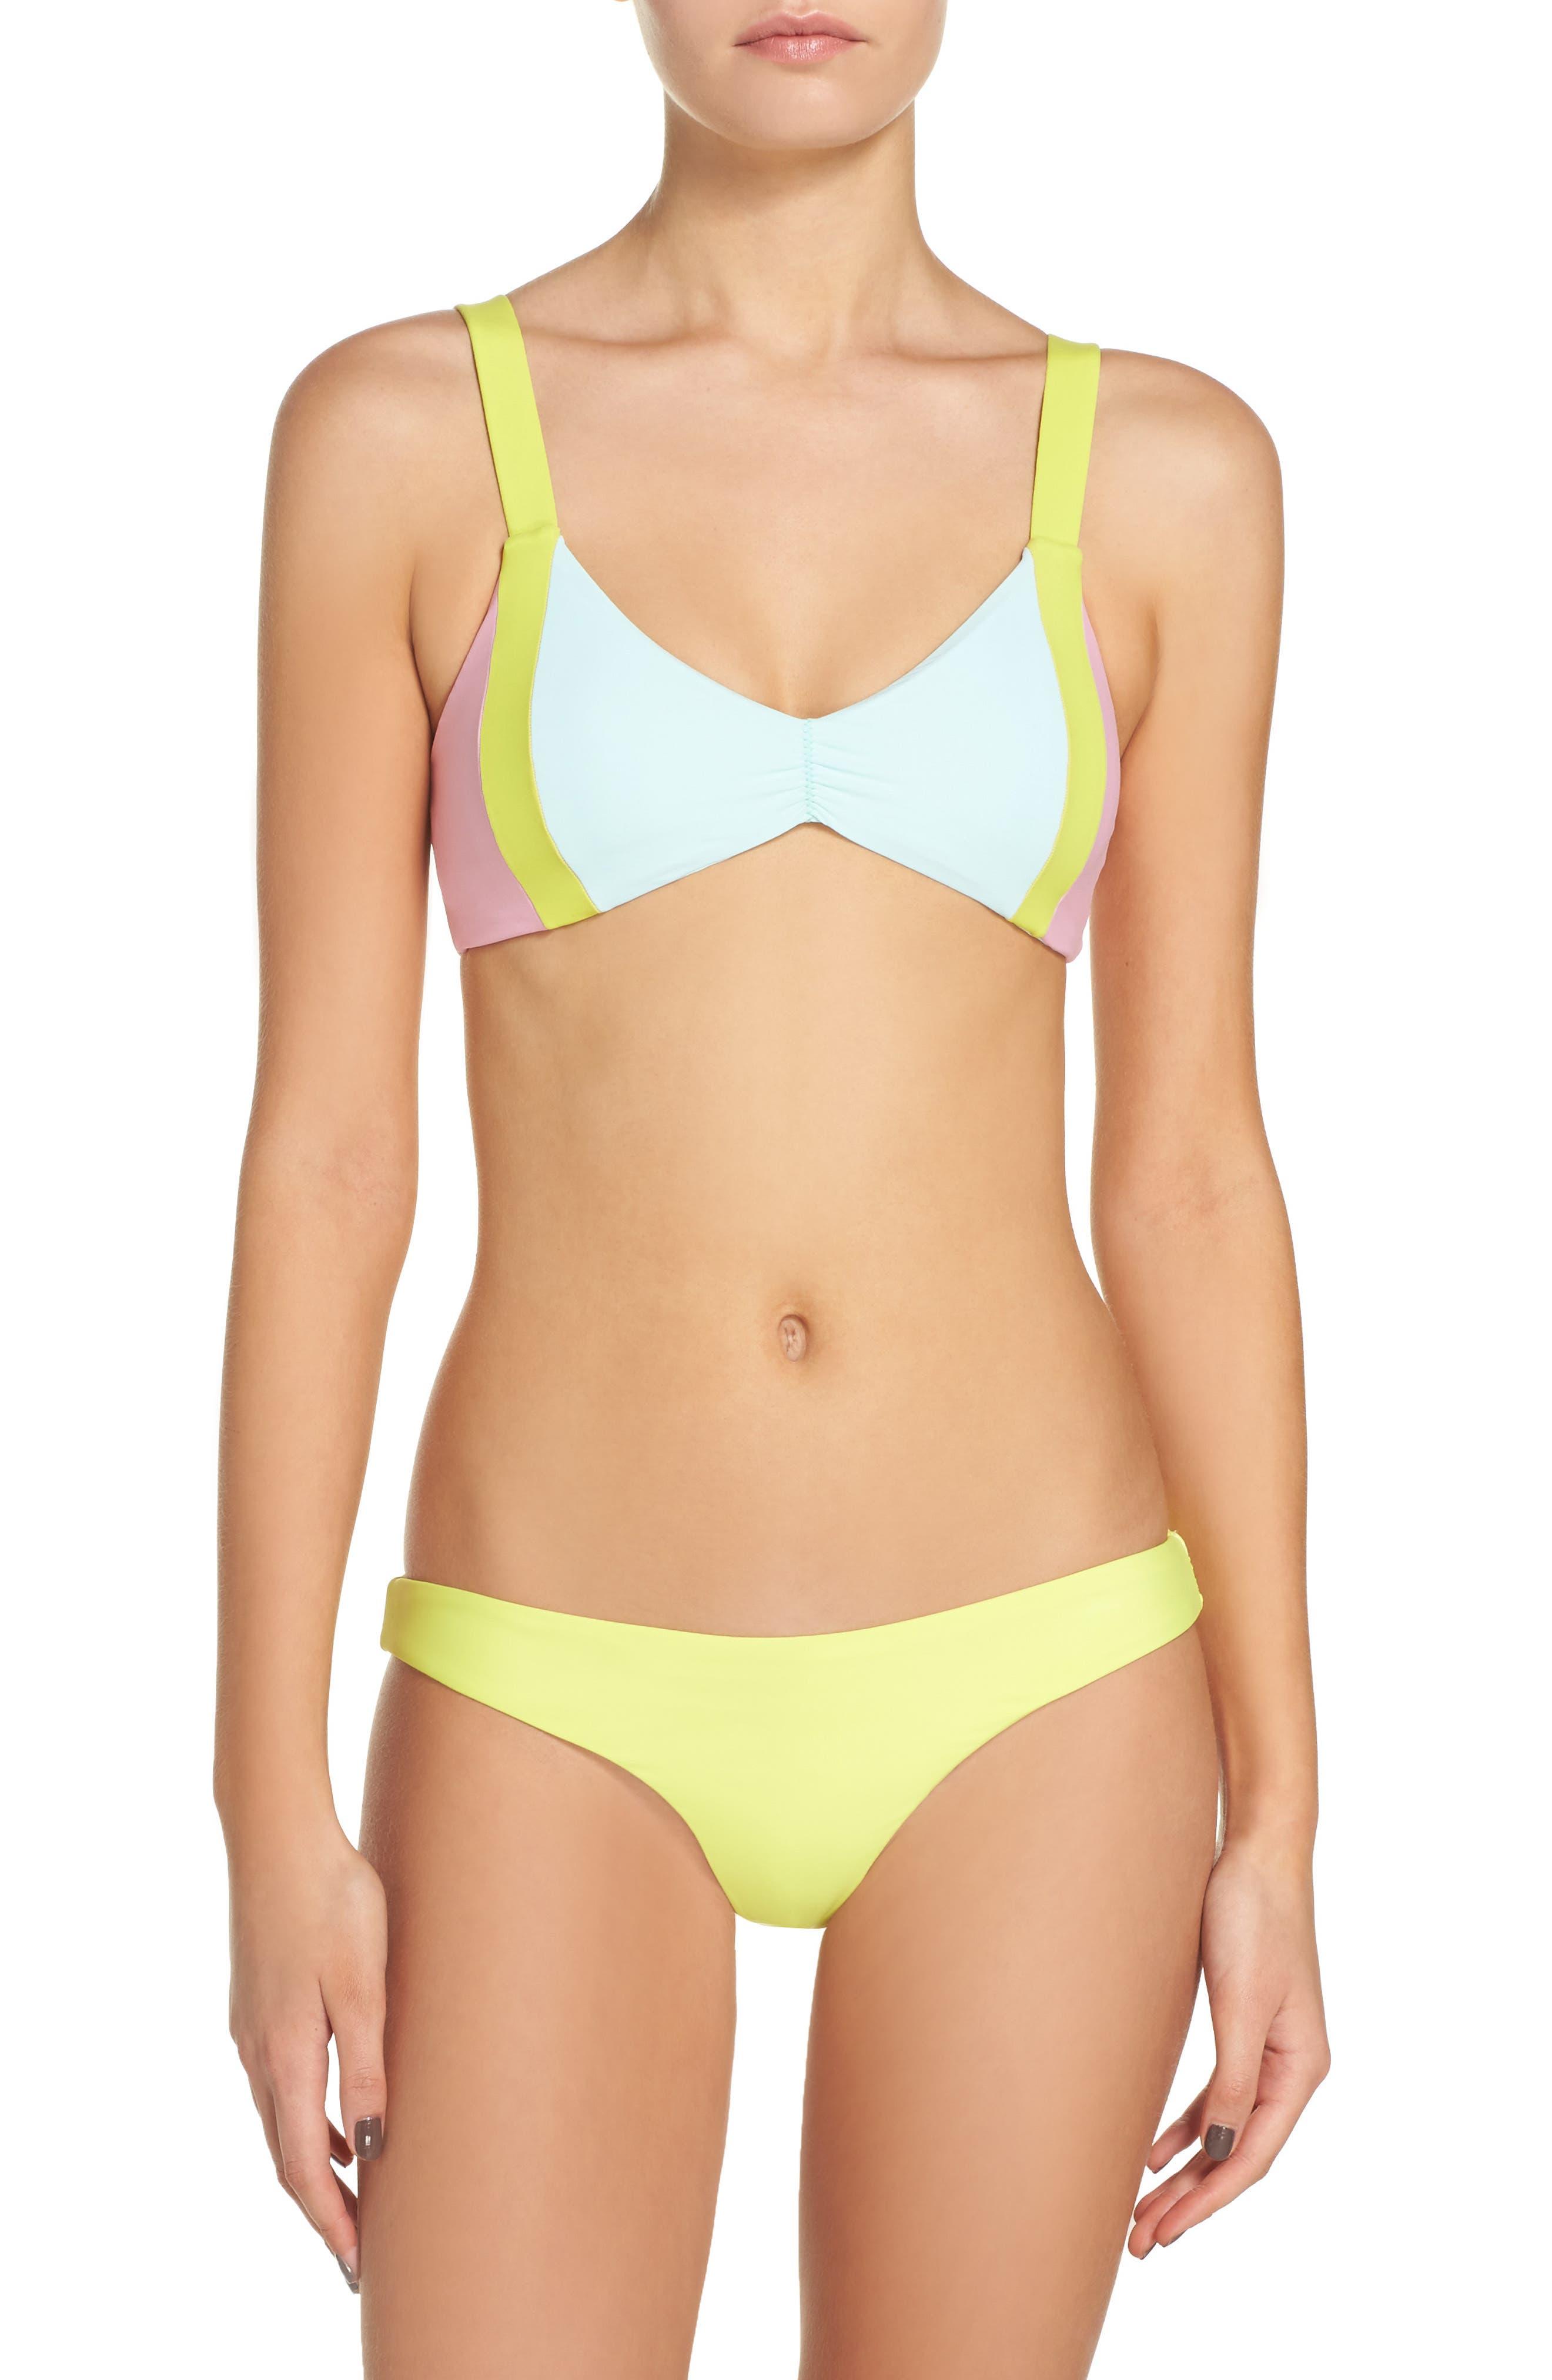 PilyQ Bikini Top & Bottoms